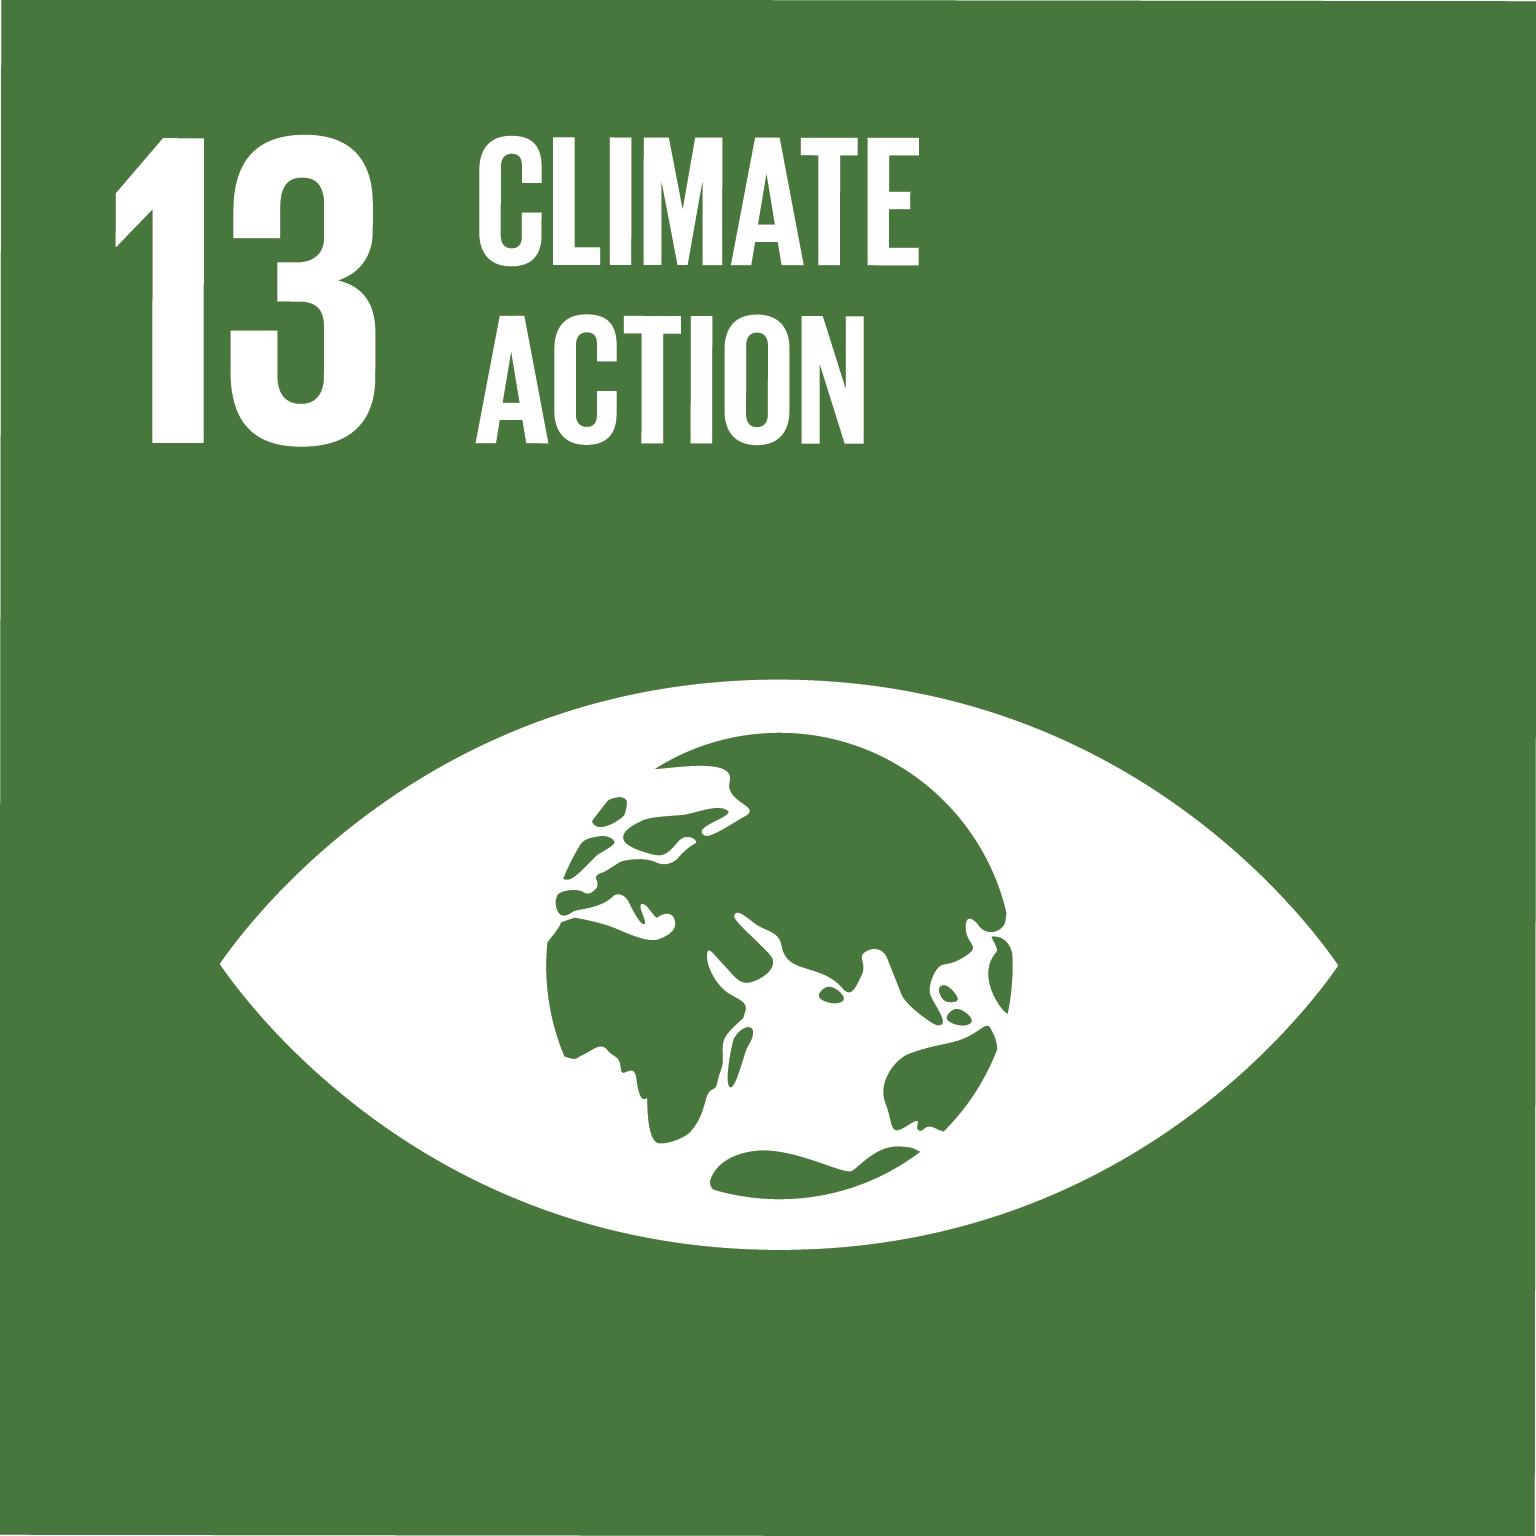 SDG13: Climate Action